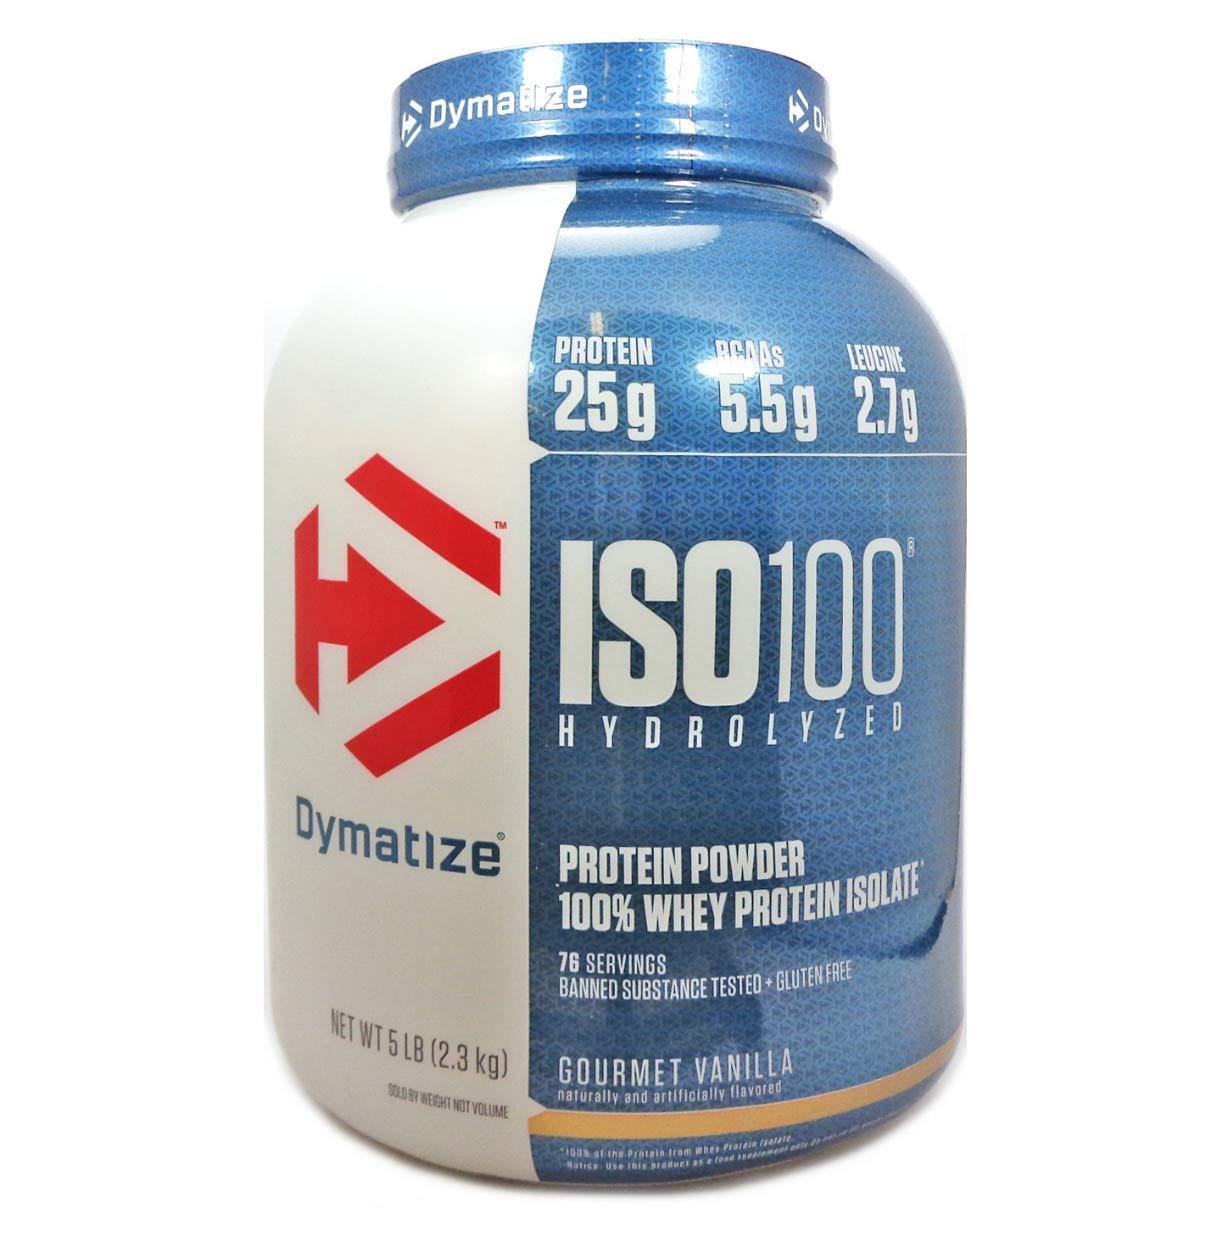 Dymatize ISO 100 Hydrolyzed Whey Protein Powder Isolate, Gourmet Vanilla, 5 Pound